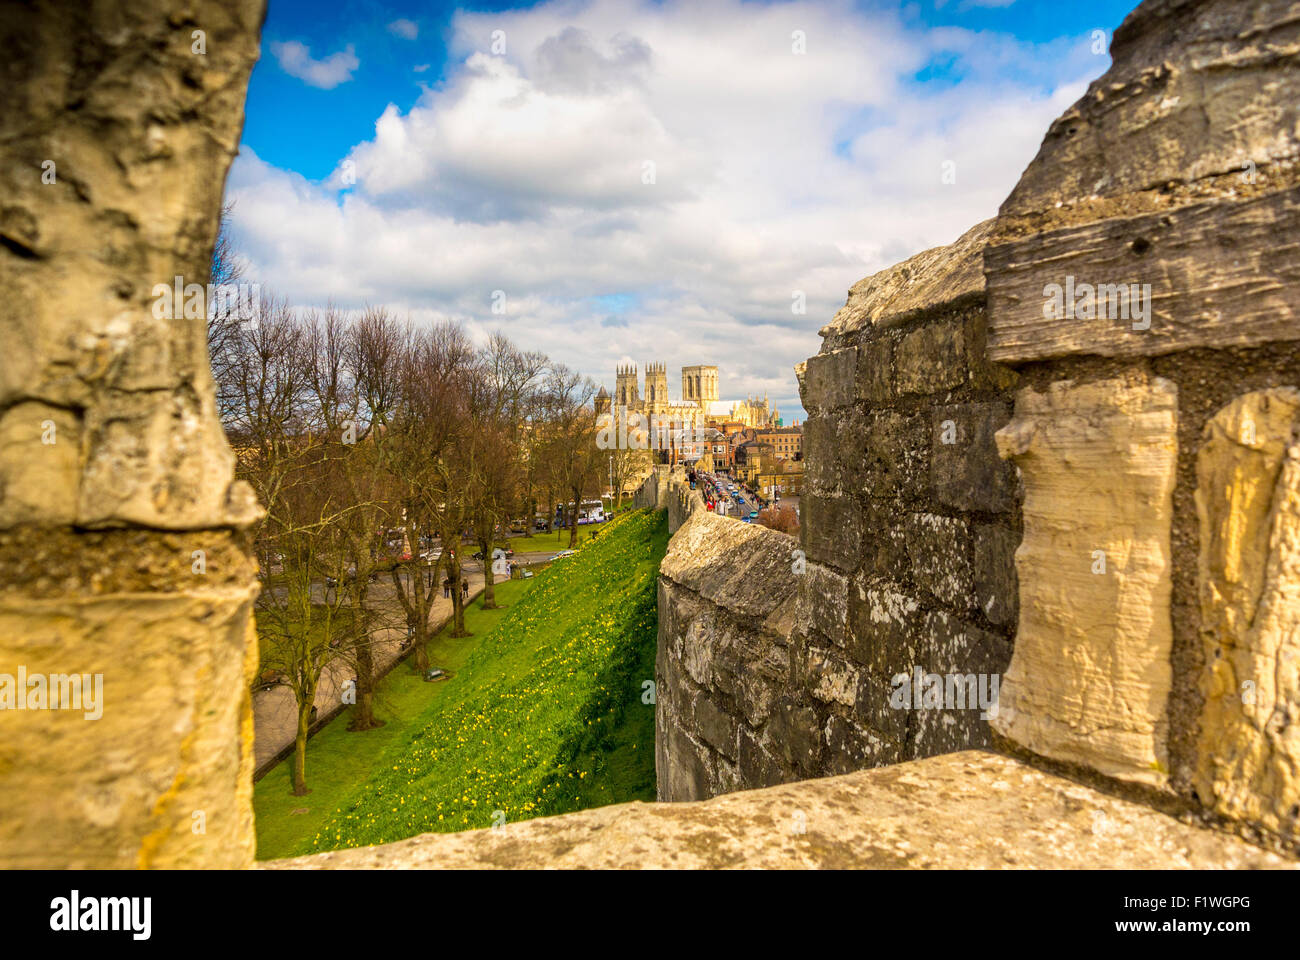 Bar Walls and York Minster - Stock Image